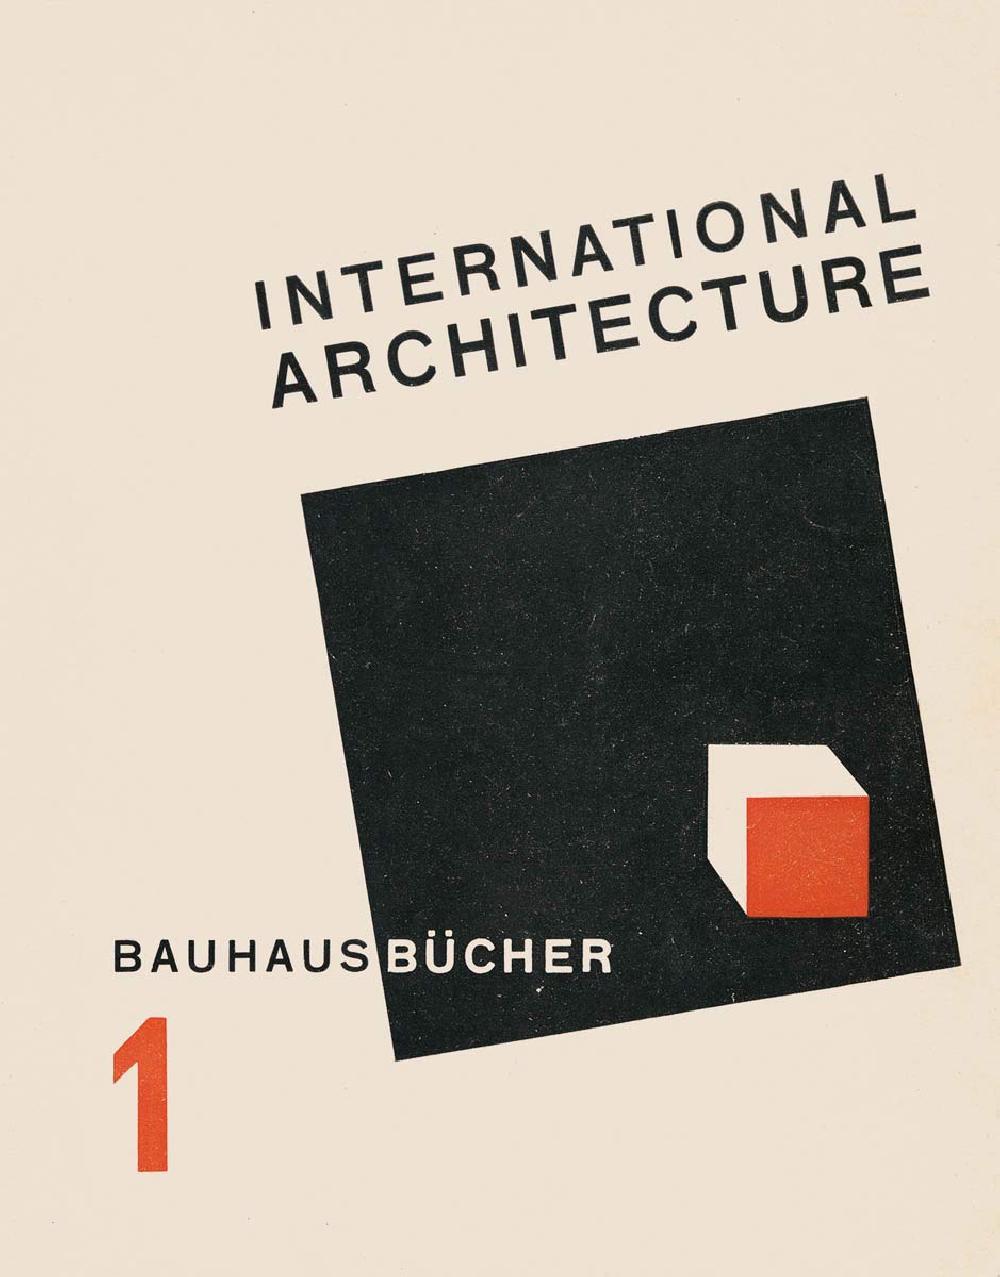 Bauhausbucher 1 - Walther Gropius international architecture